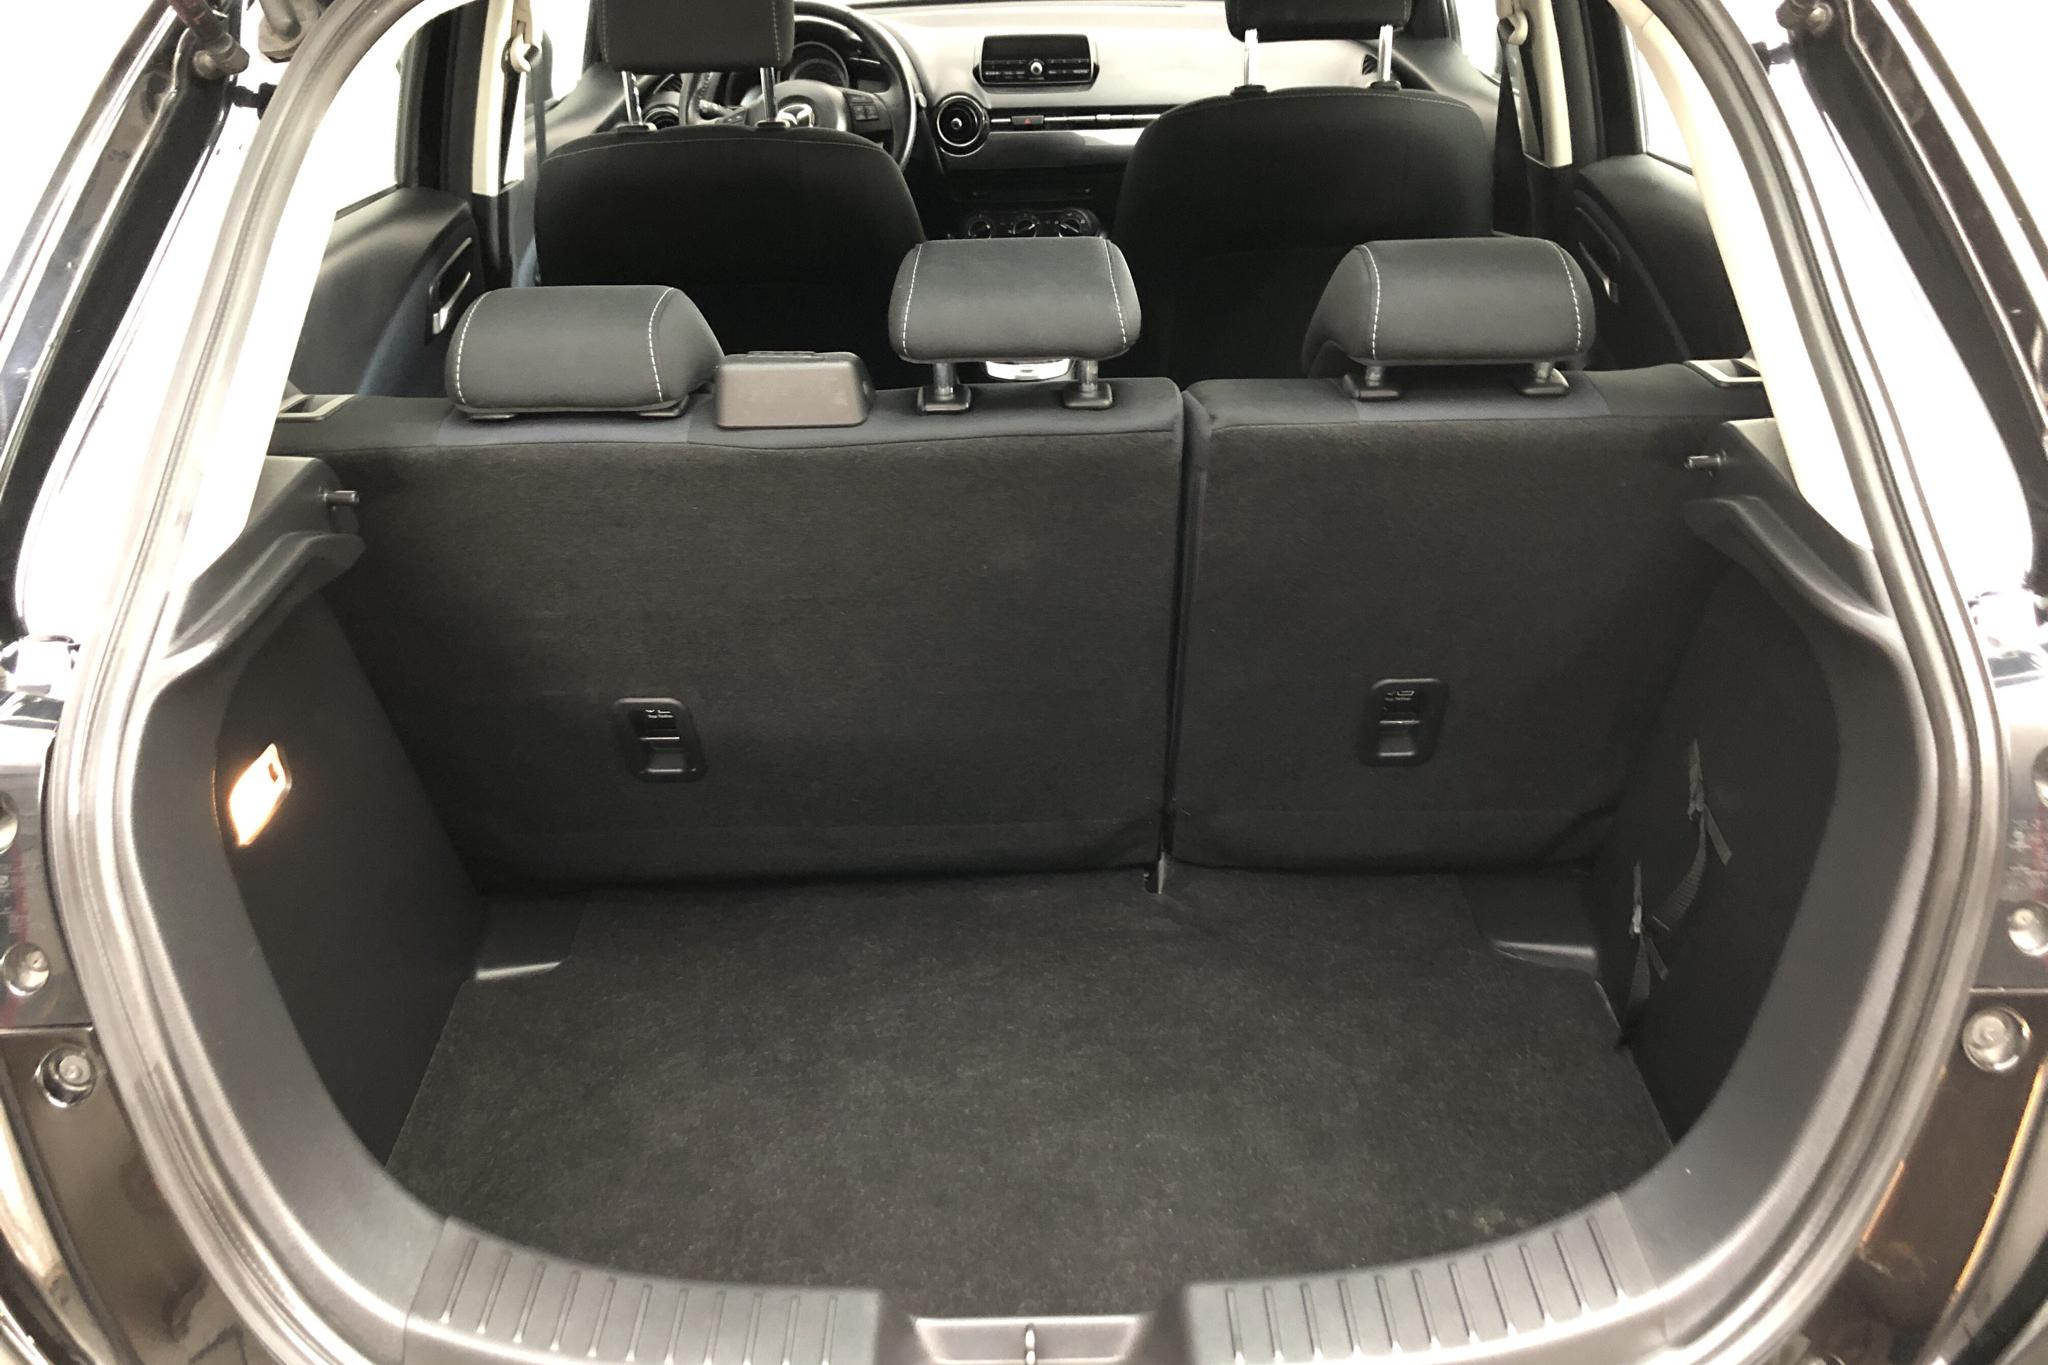 Mazda 2 1.5 5dr (90hk) - 8 434 mil - Automat - svart - 2016